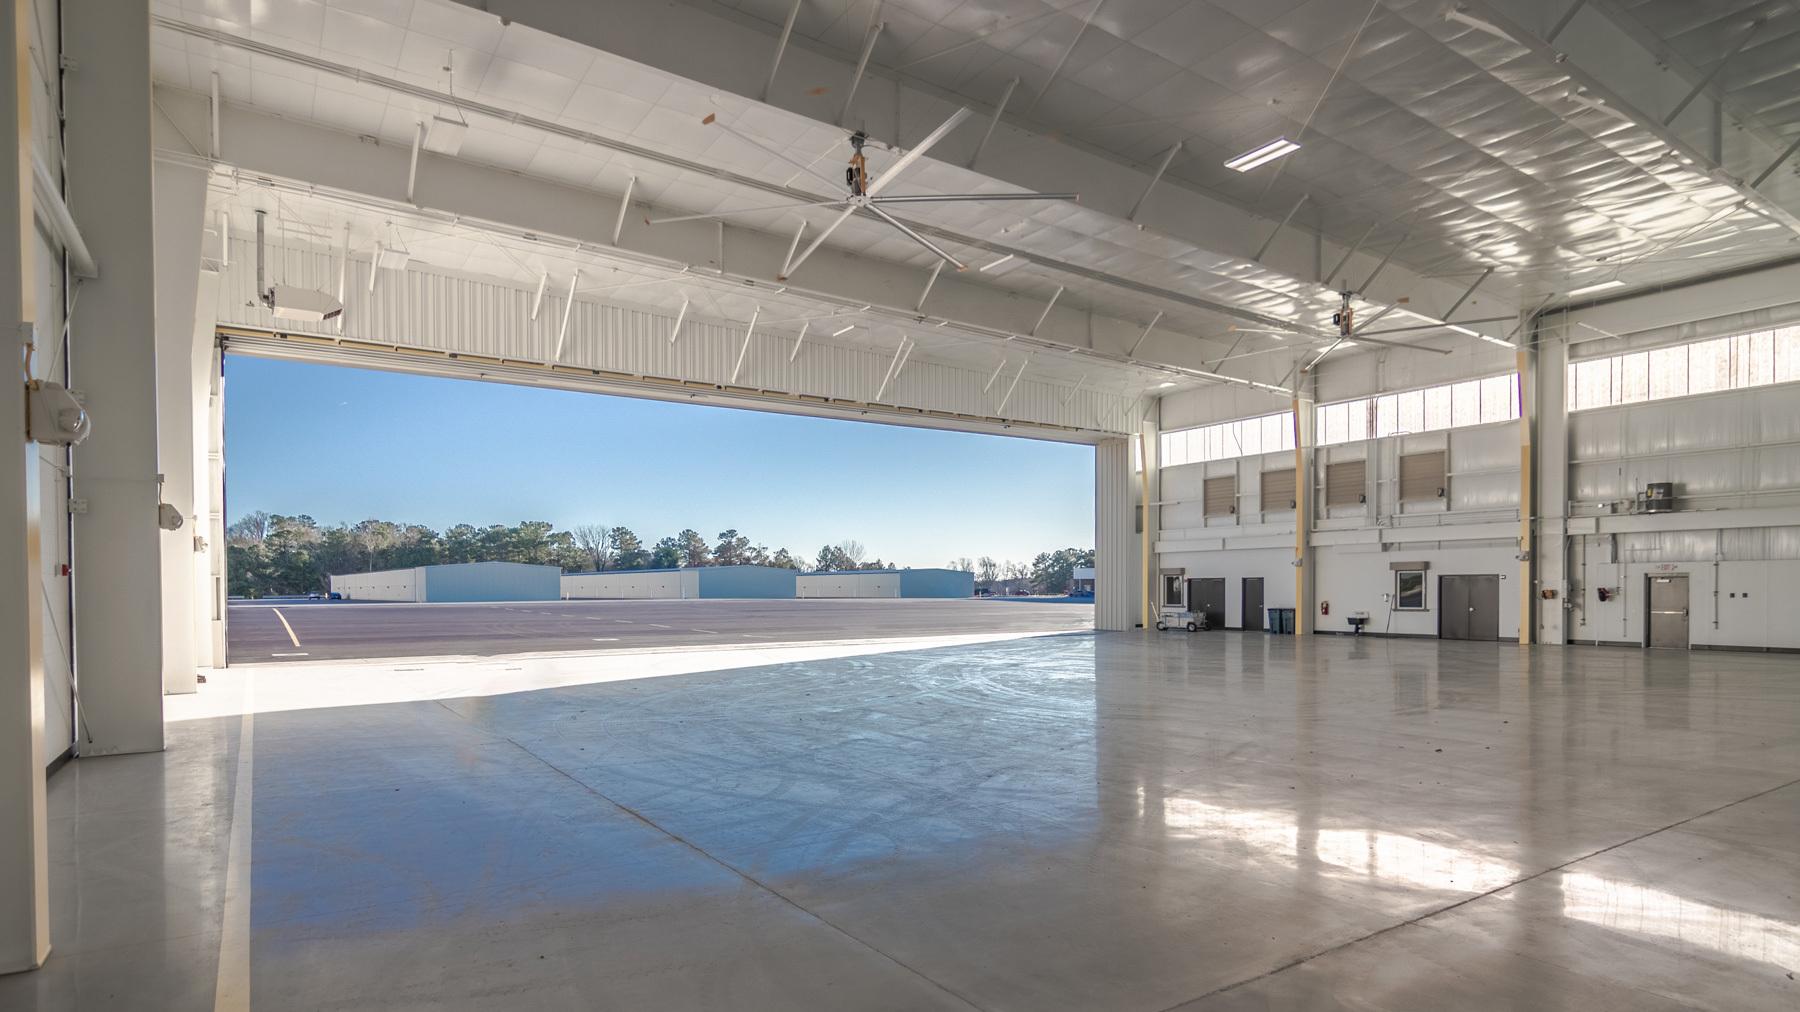 PDK_Hangar-1-Interior.jpg